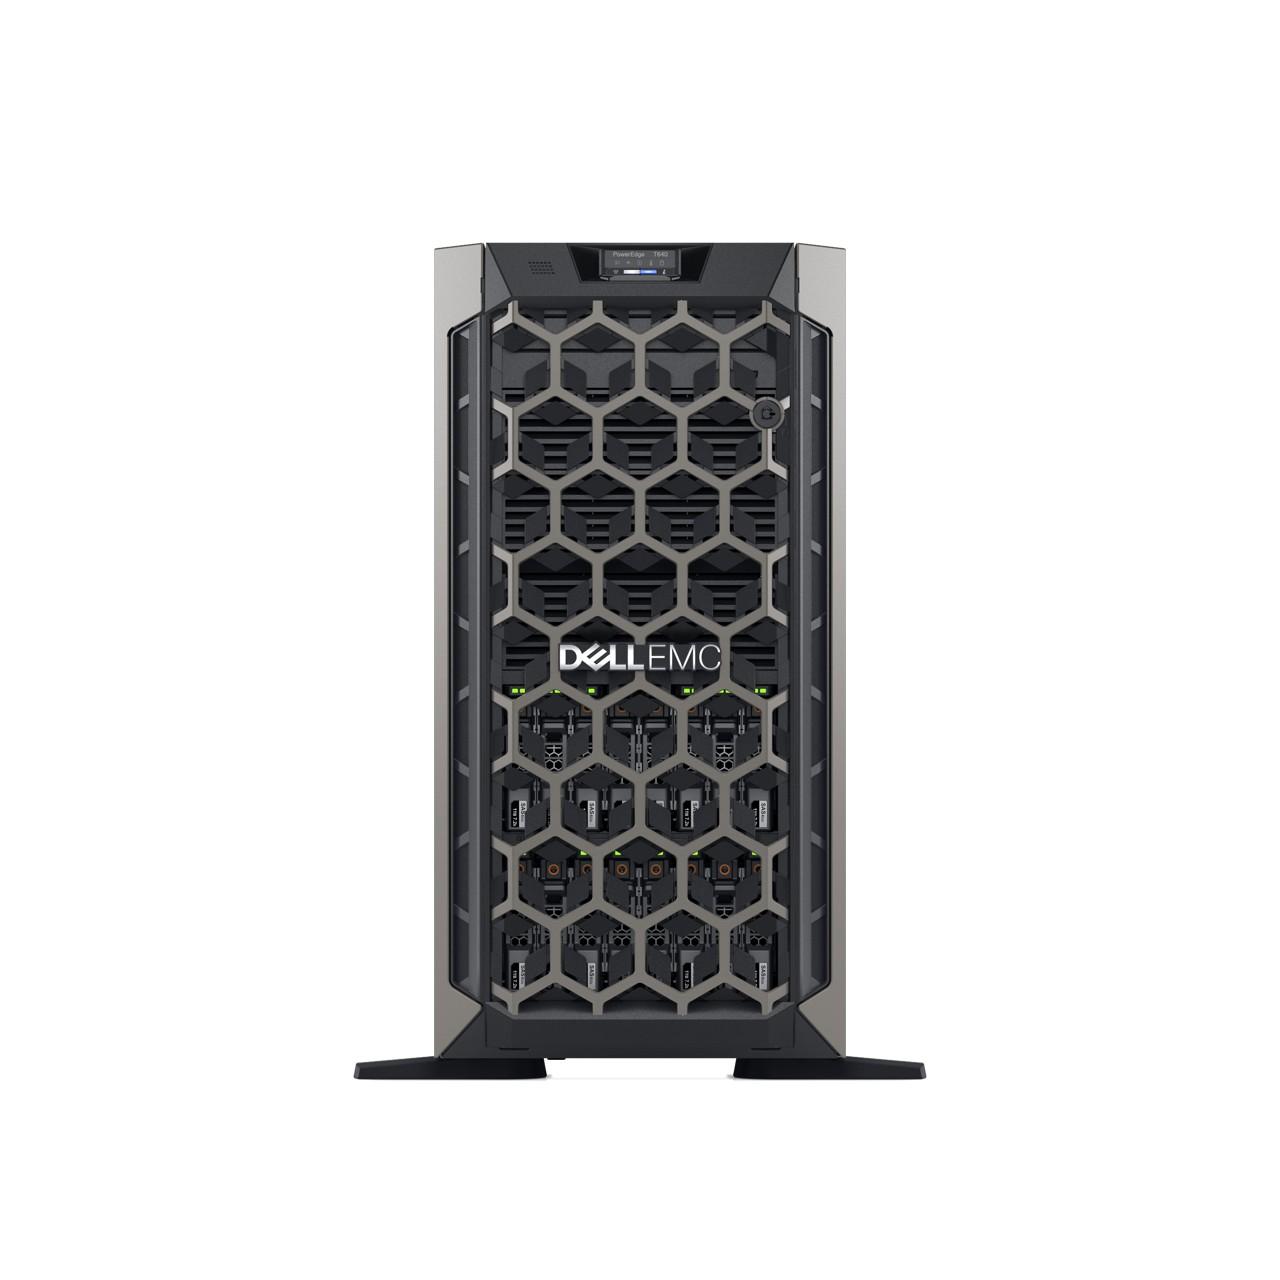 Dell EMC T640 Front